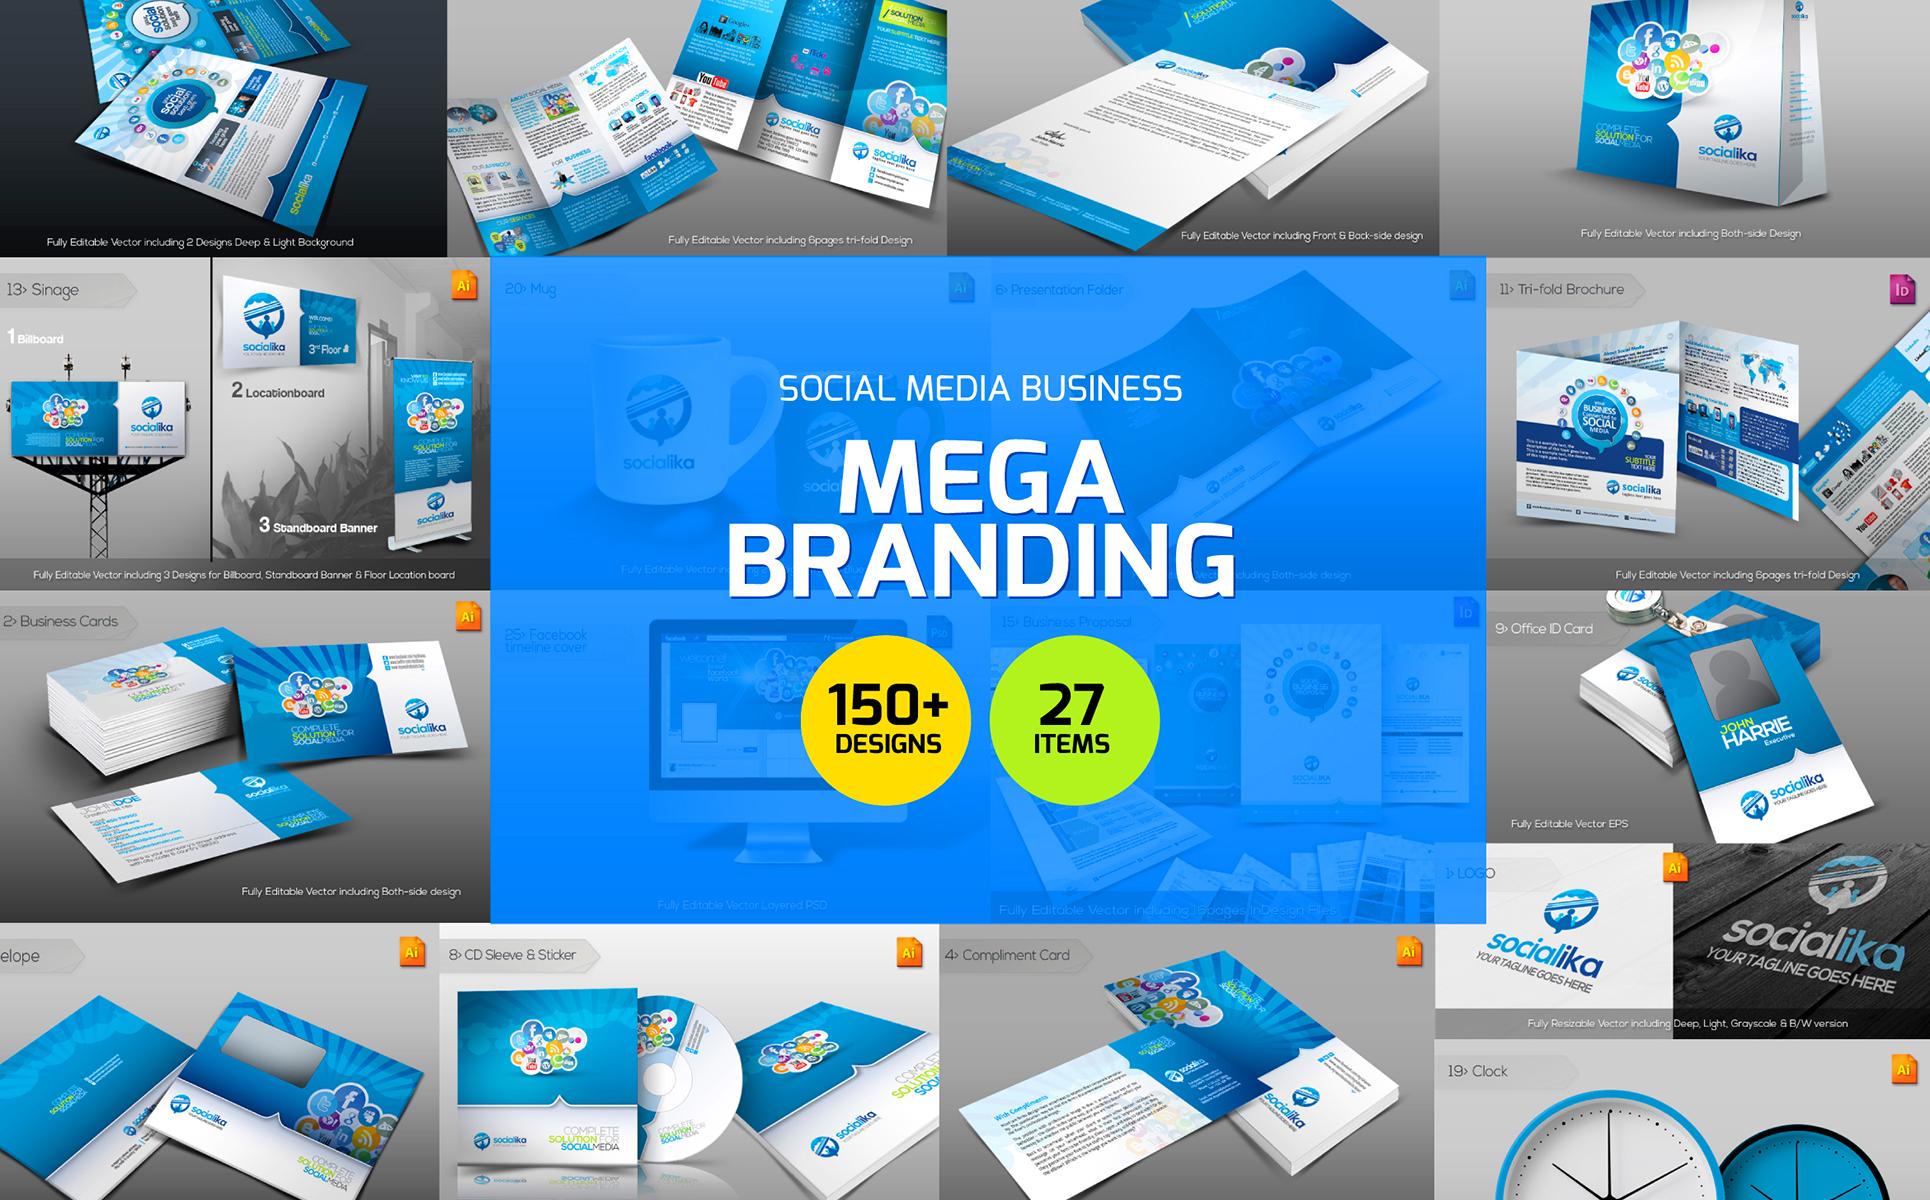 Social media branding corporate identity template 66909 zoom in maxwellsz